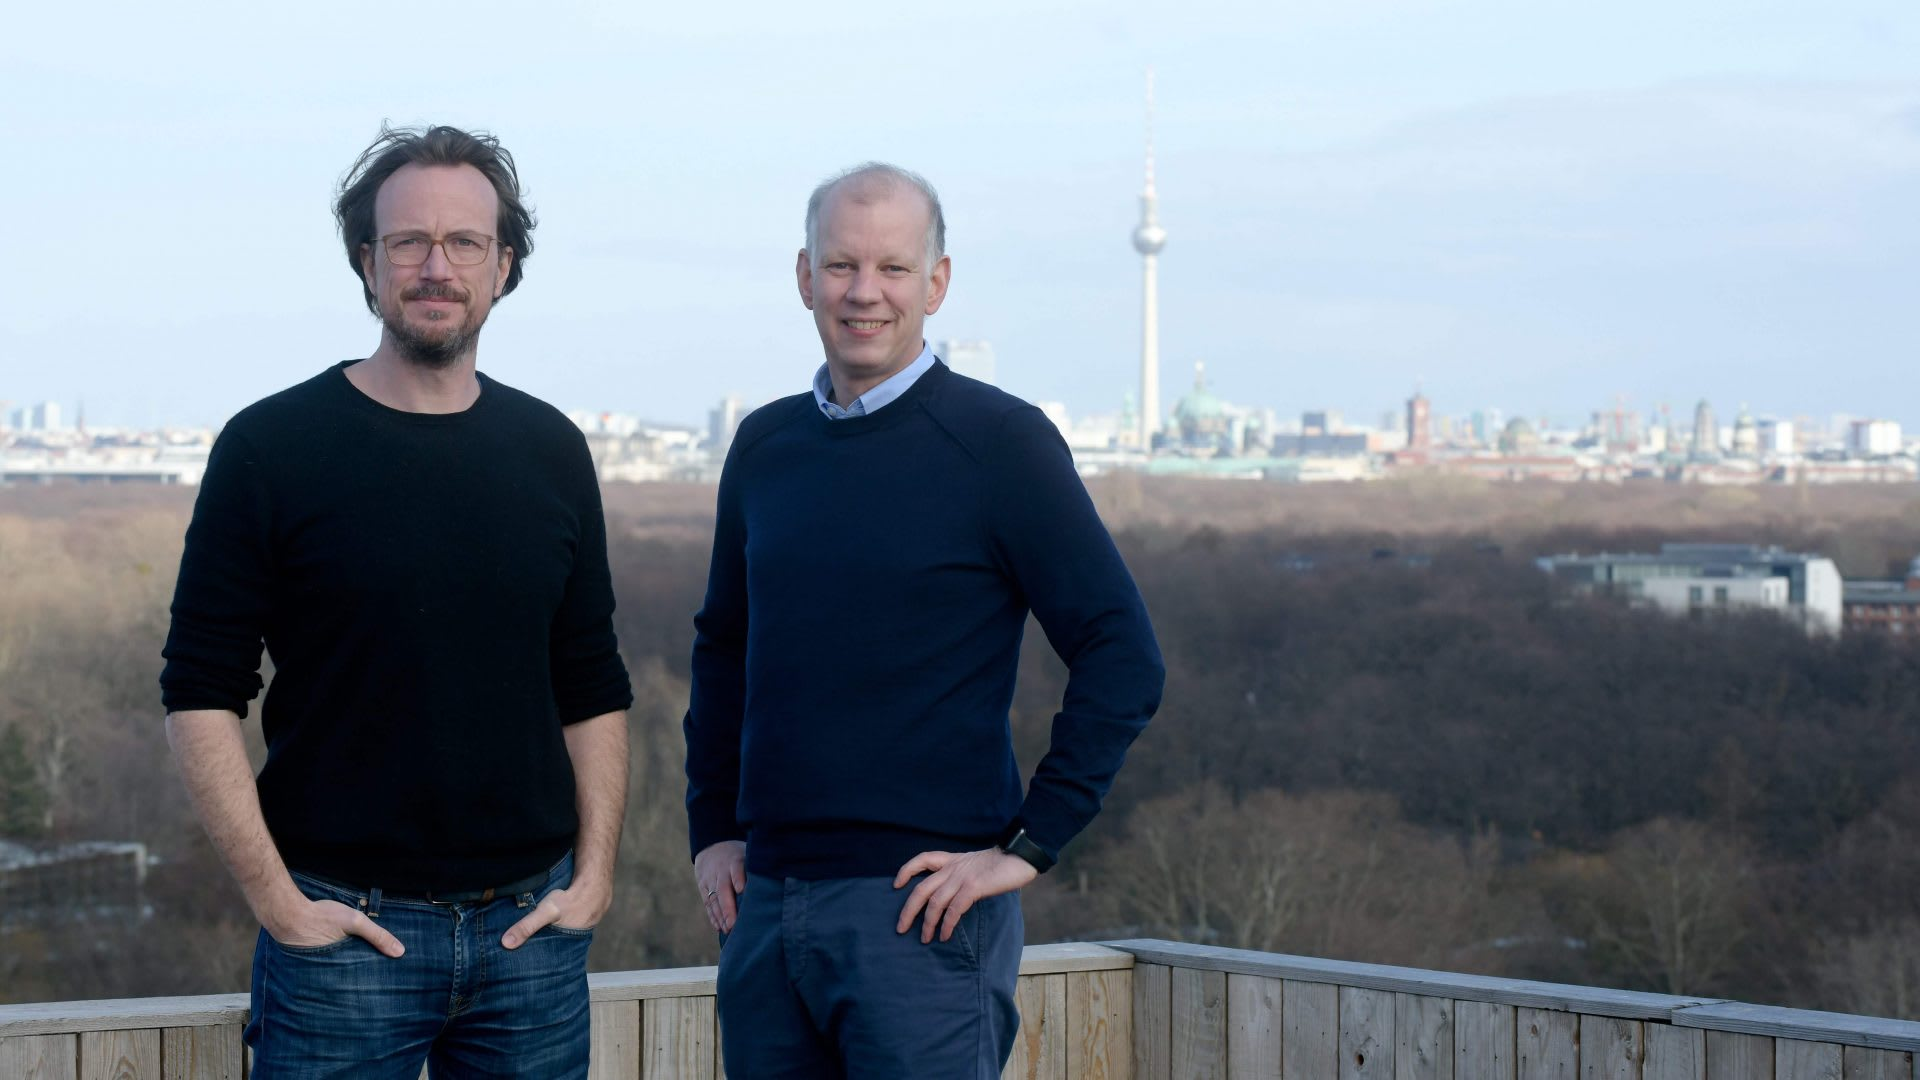 Magnus Kobel and Christian Macht in Berlin